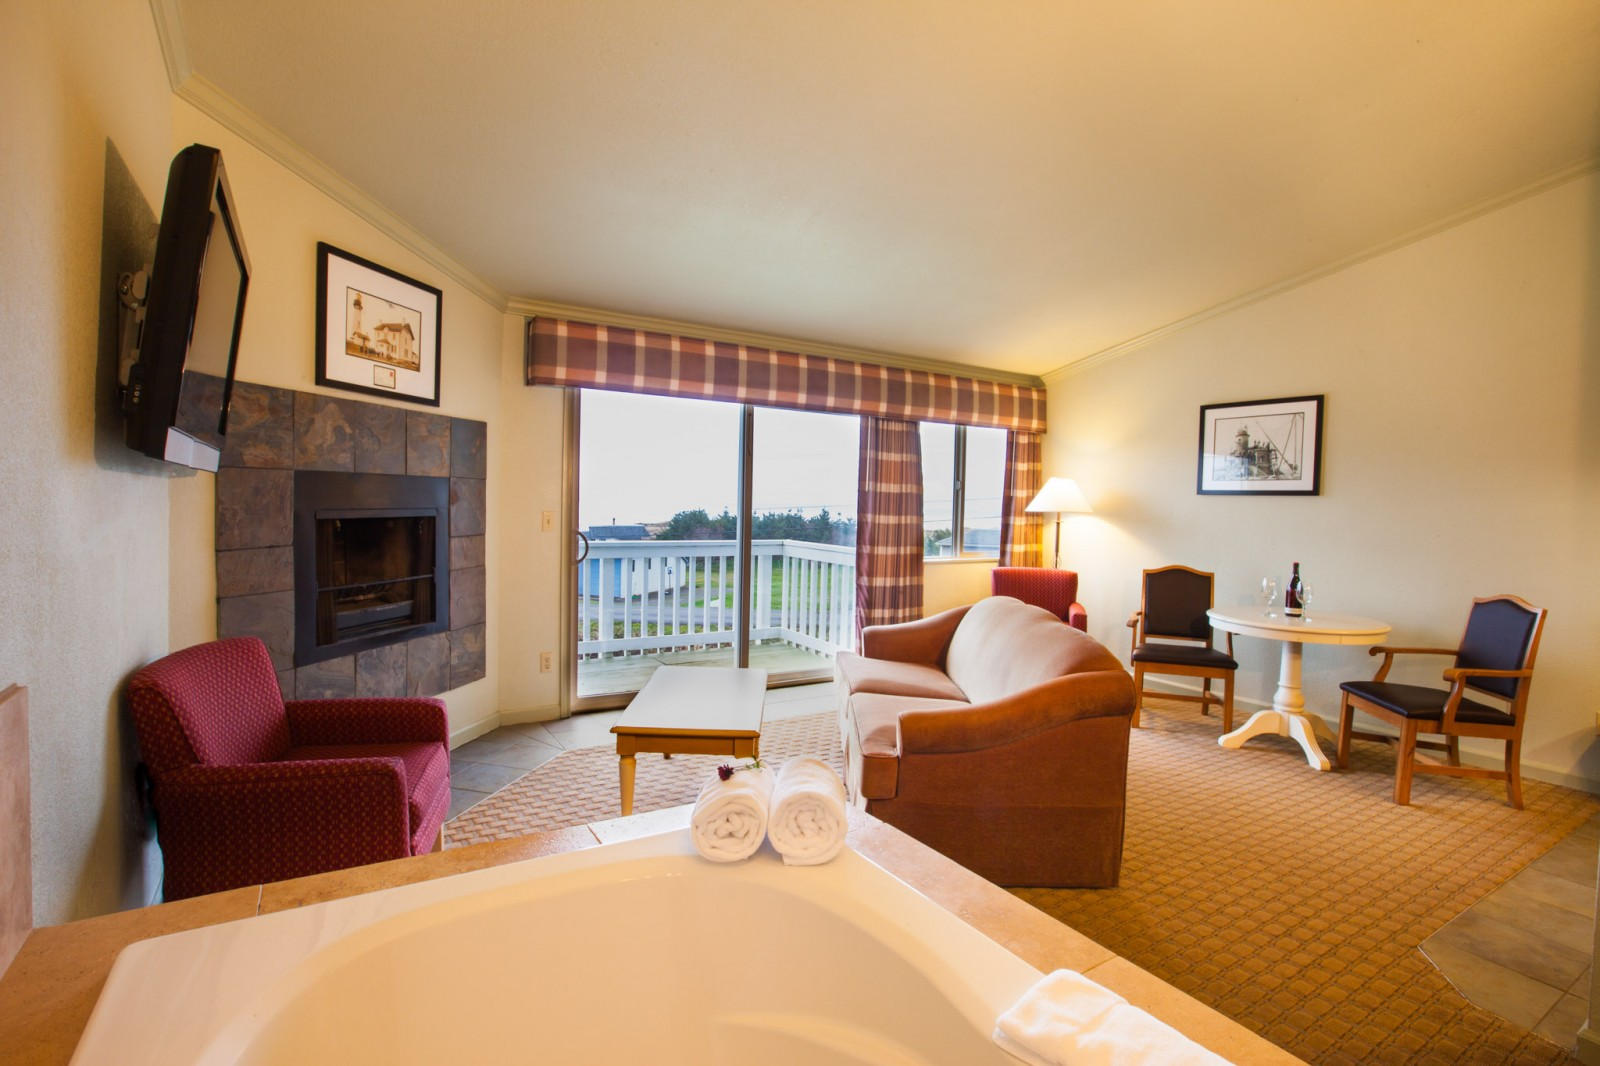 Inn-at-Face-Rock-Bandon-Hotel-Interior-17